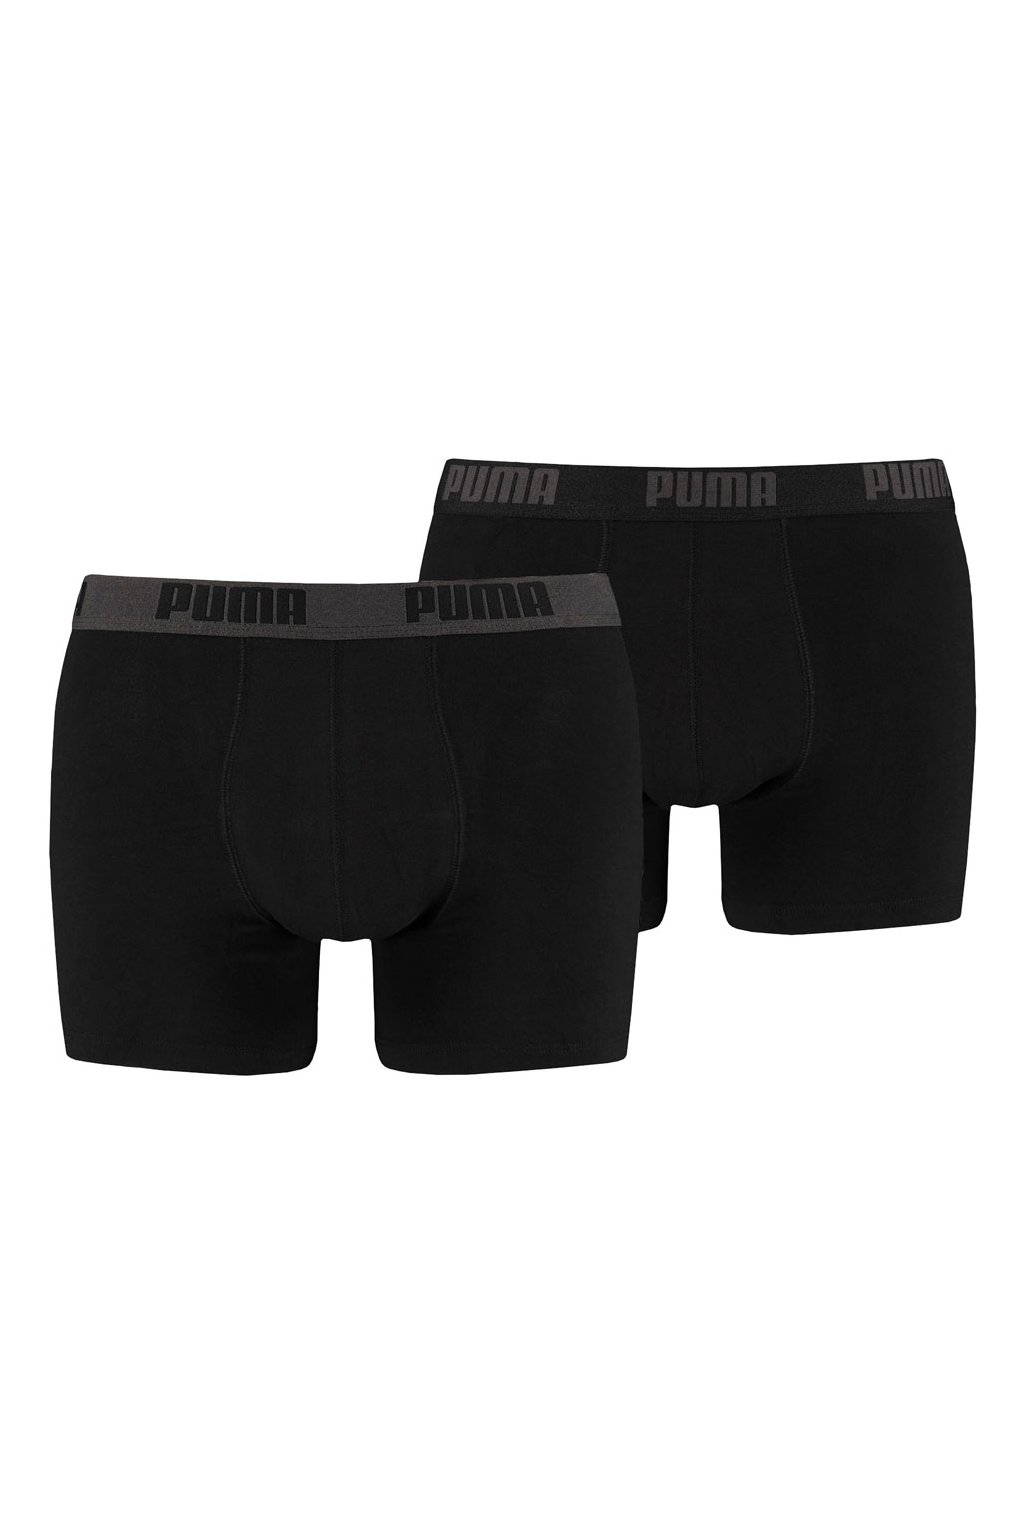 Boxerky pánske Puma Basic Boxer 2P čierne 521015001 230